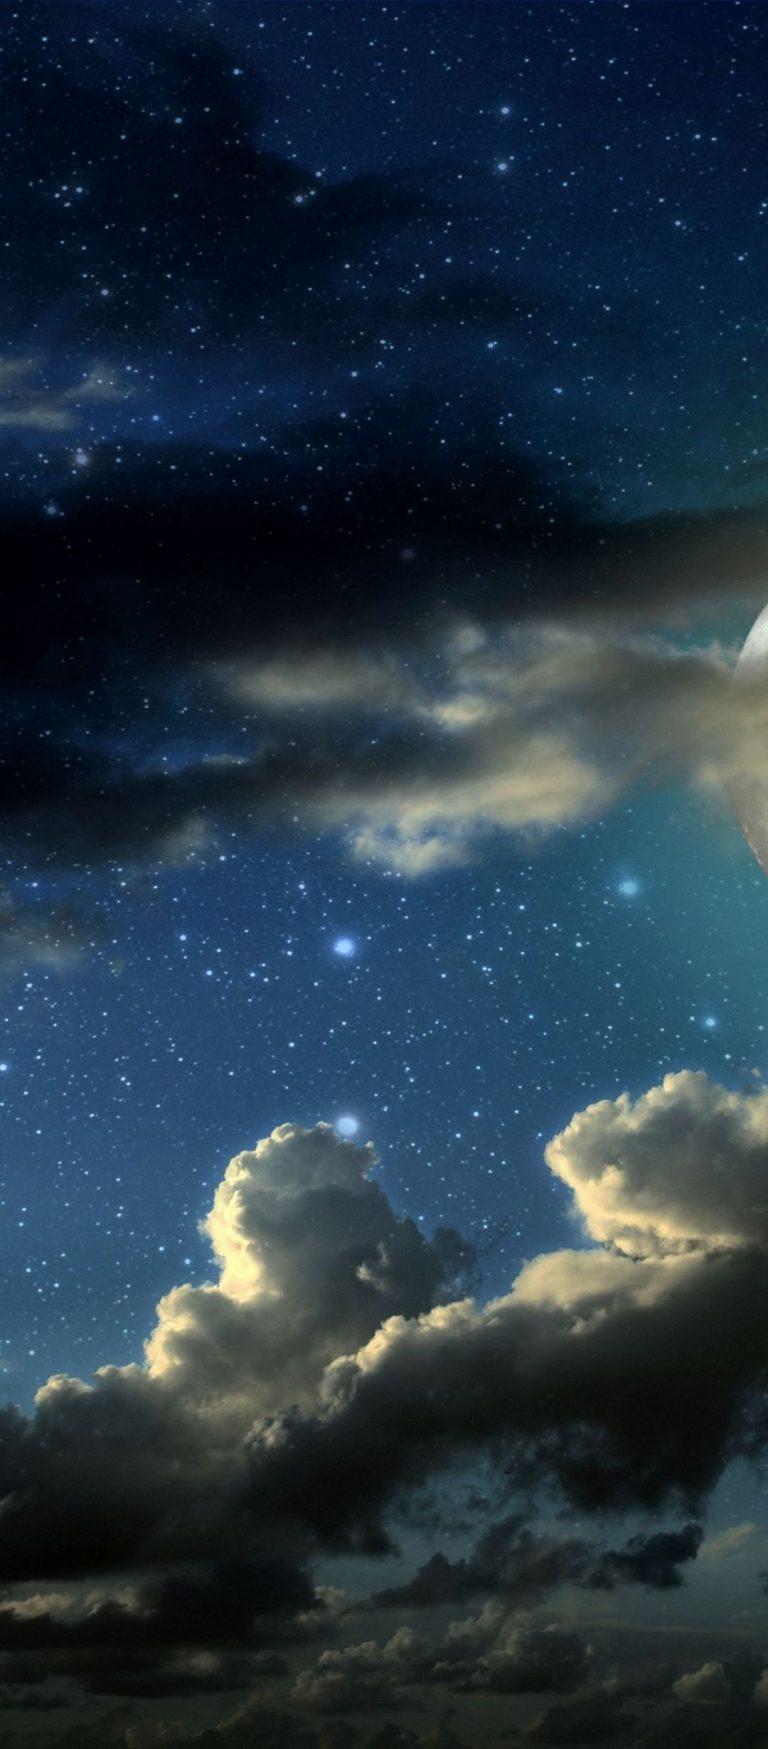 Full Moon Stars Clouds Shadows 1080x2460 768x1749